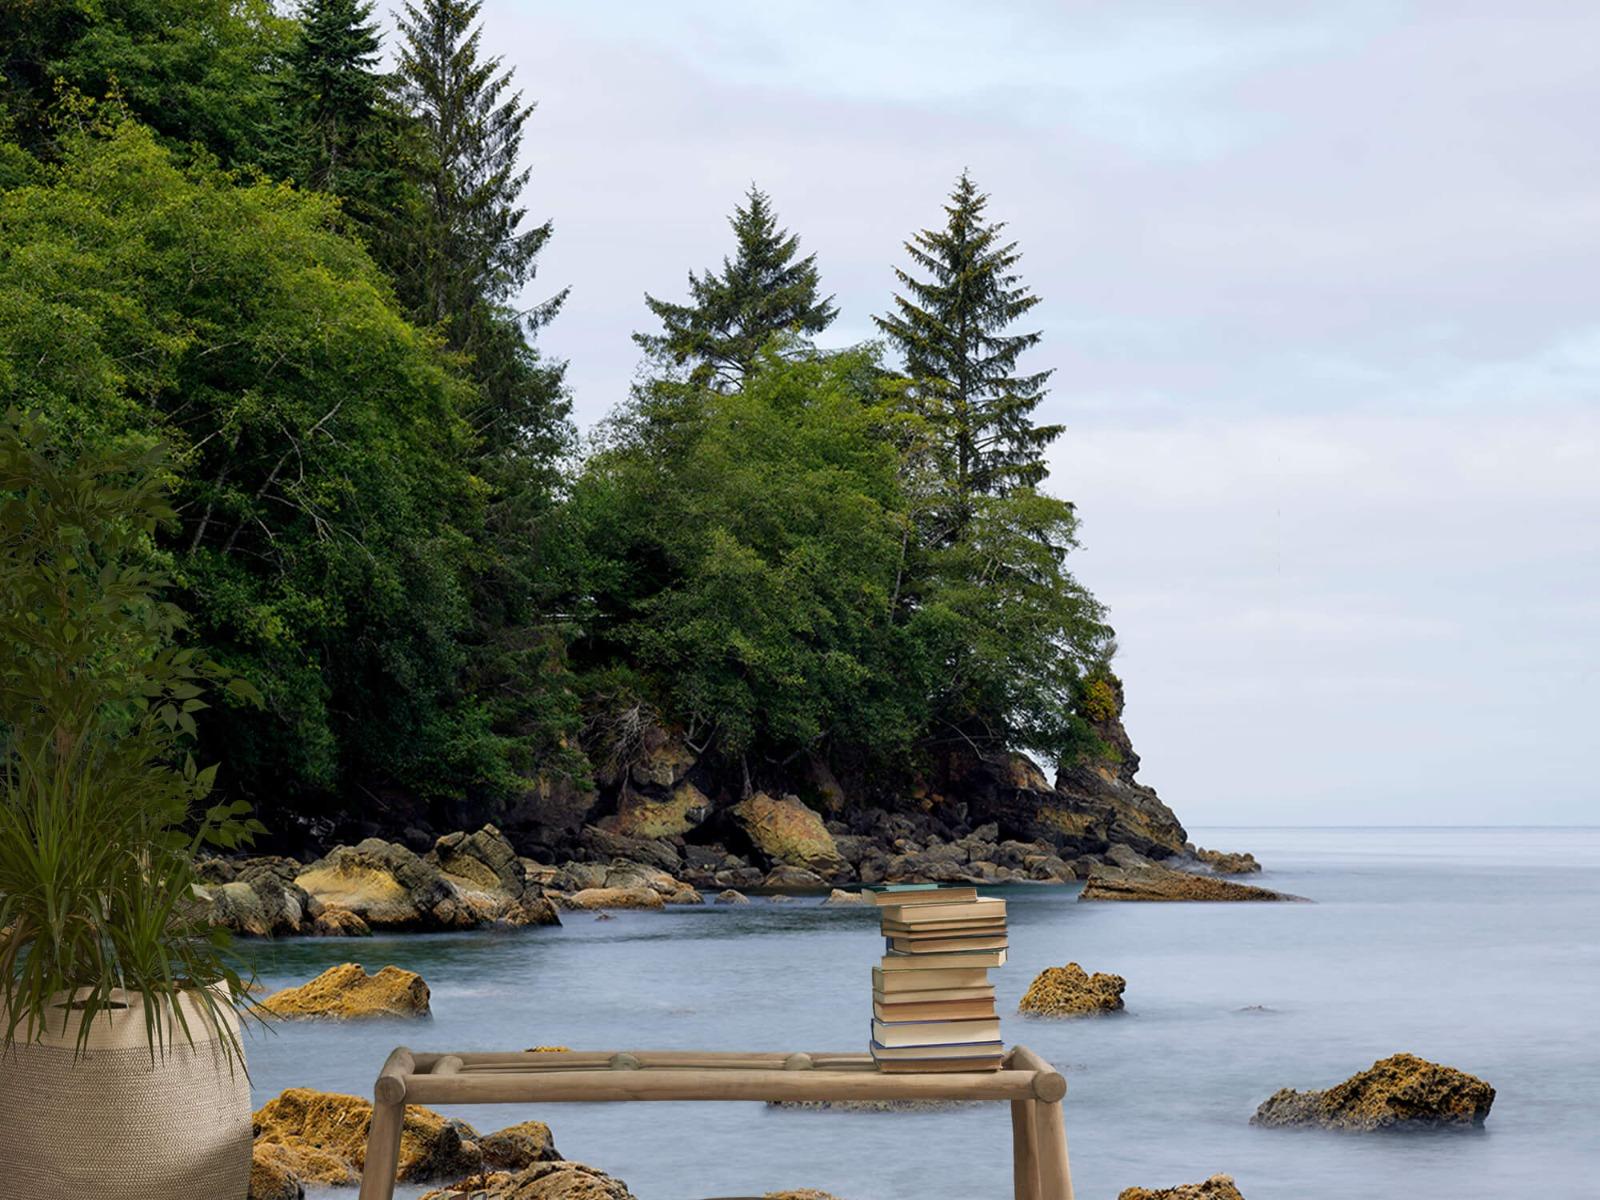 Bomen - Ruwe kustlijn - Slaapkamer 20